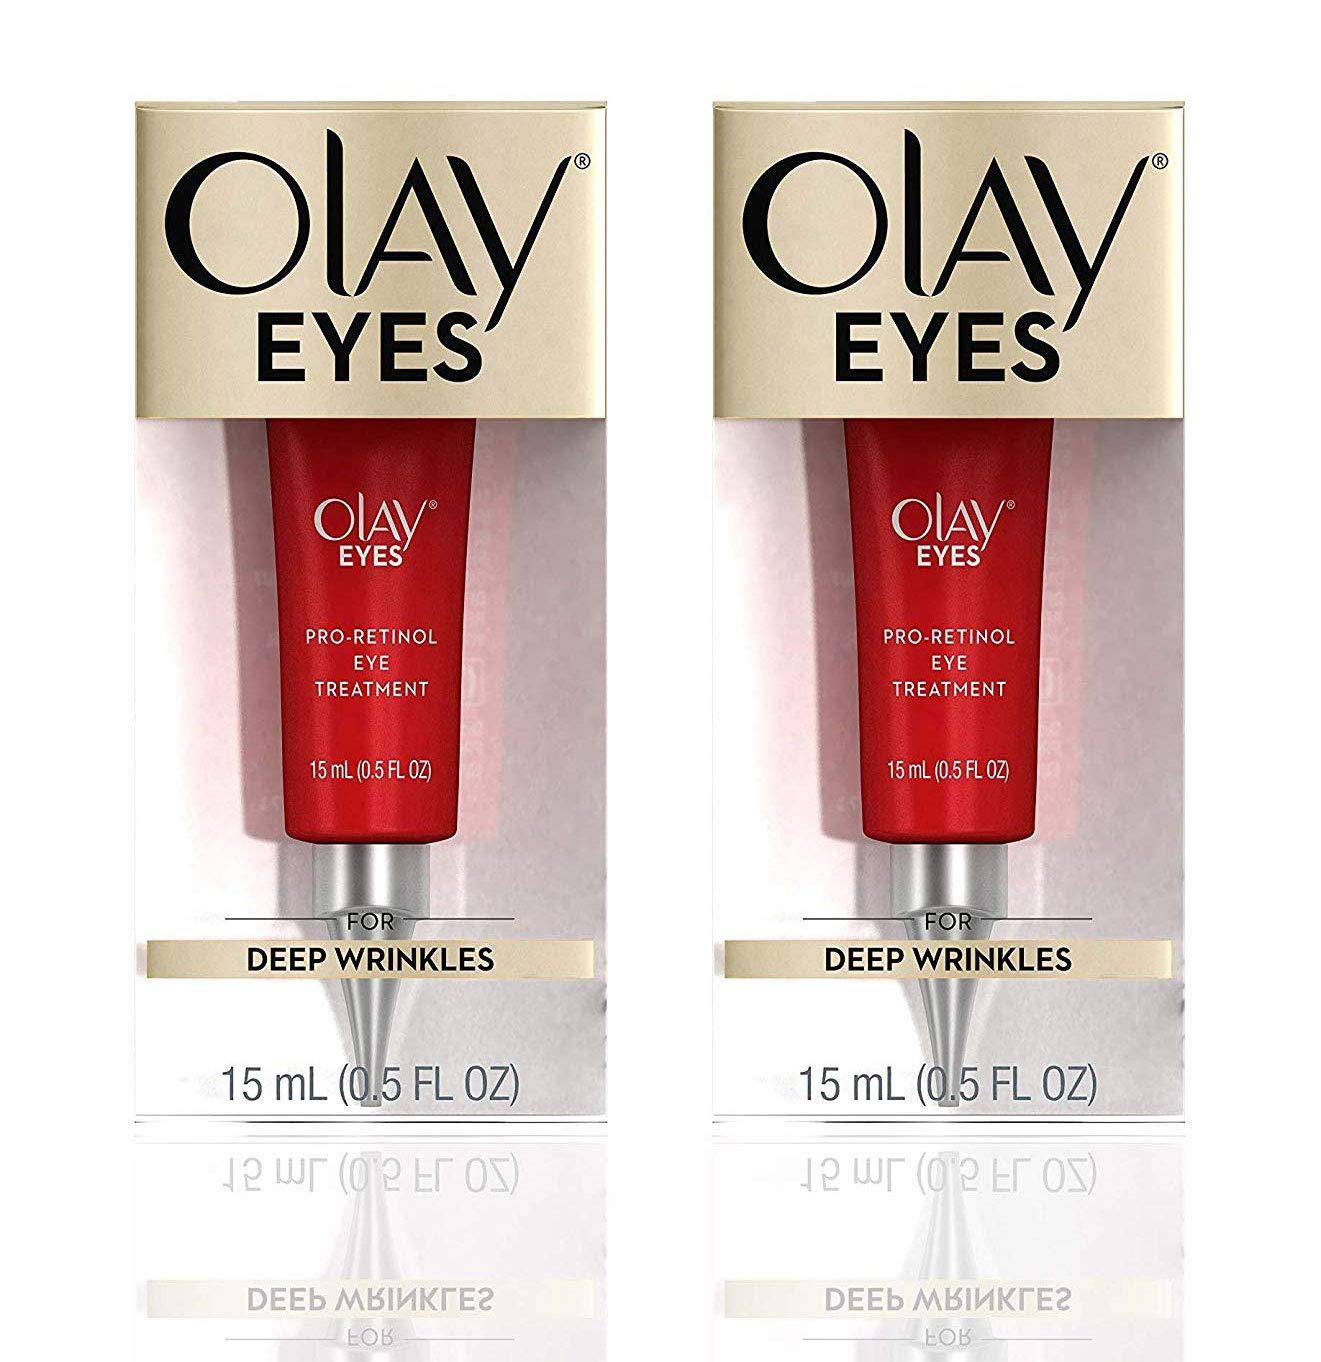 (PACK of 2) 0lay Eyes Pro-Retinol Eye Treatment for Deep Wrinkles - 0.5 Fl Oz (15 ml) EACH